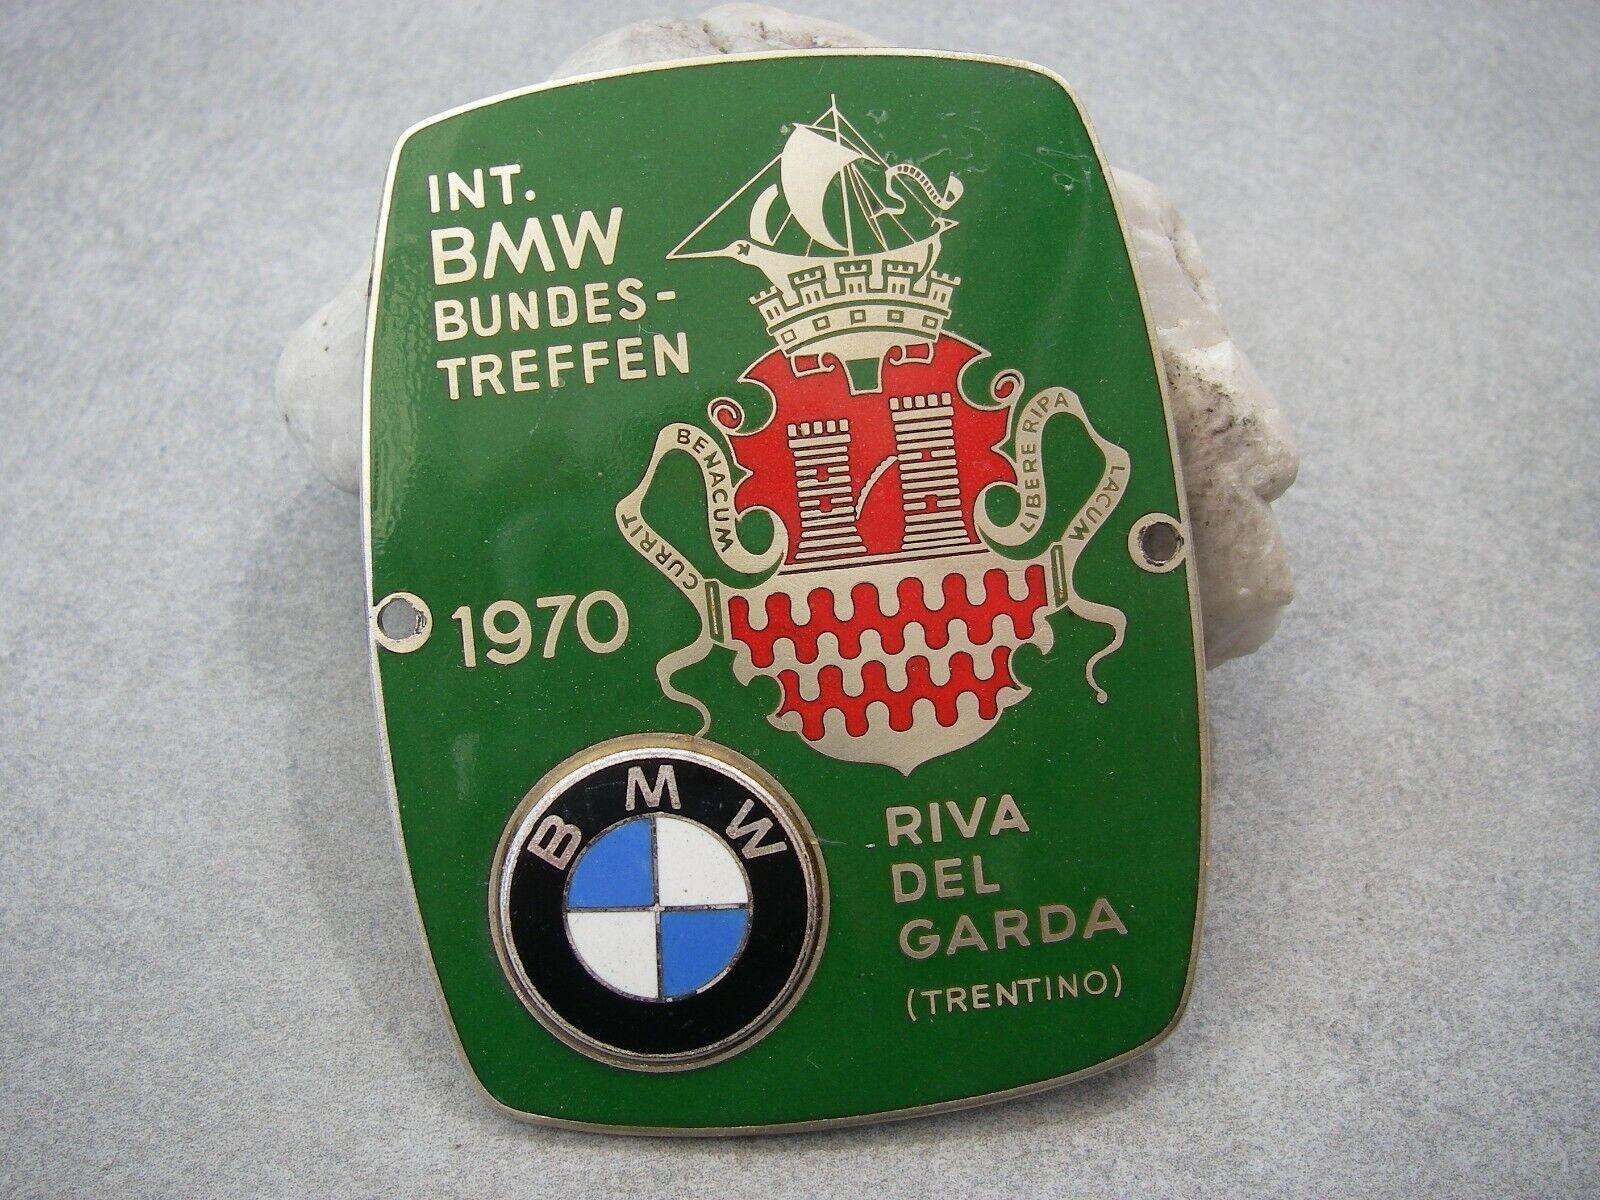 vintage INTERNATIONAL BMW MEETING ITALY RIVA DEL GARDA TRENTINO 1970 Car Badge